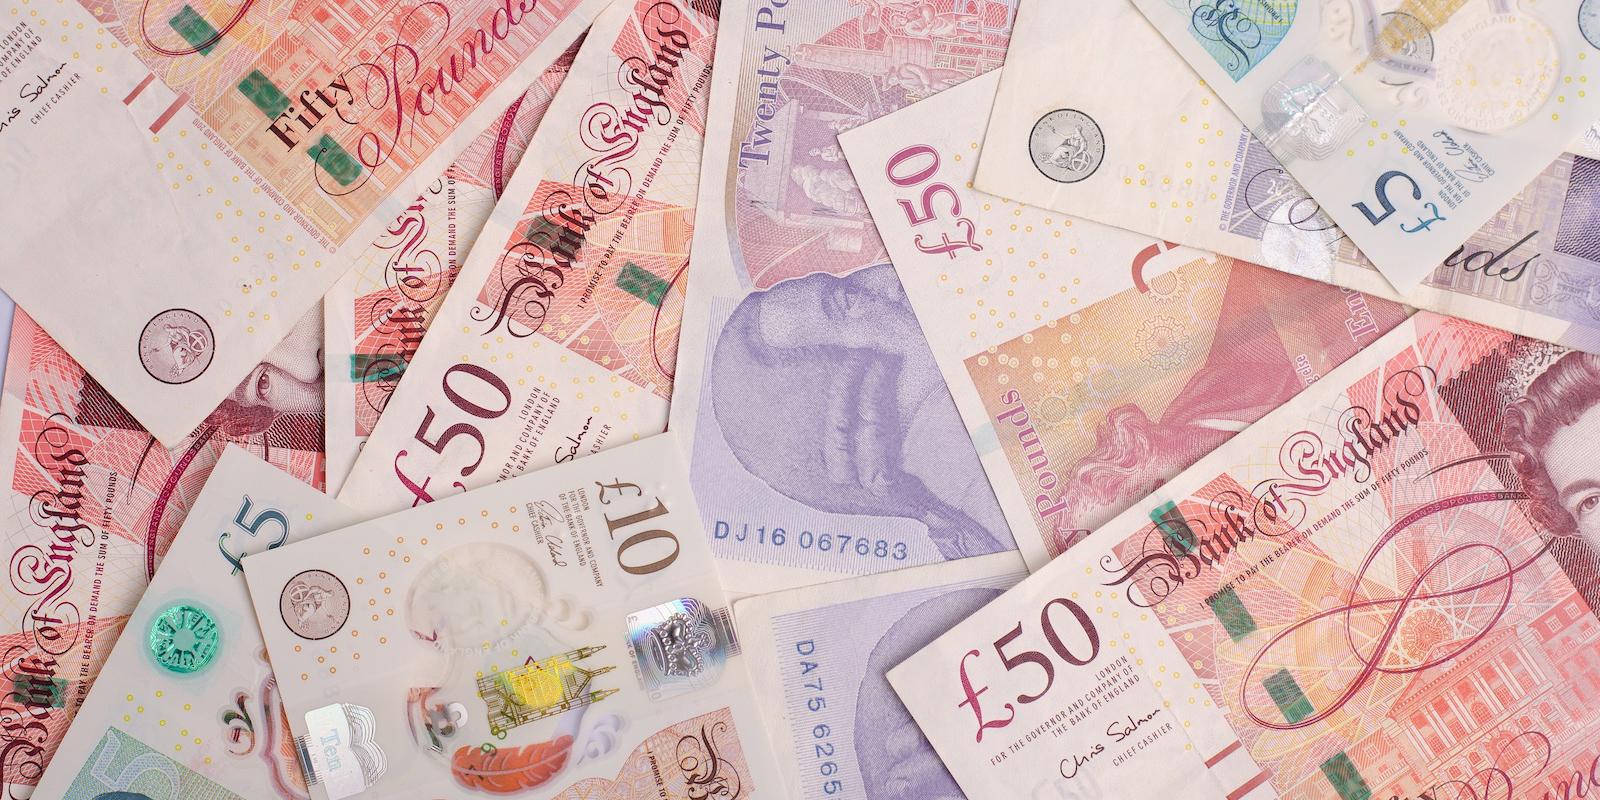 Rent in United Kingdom